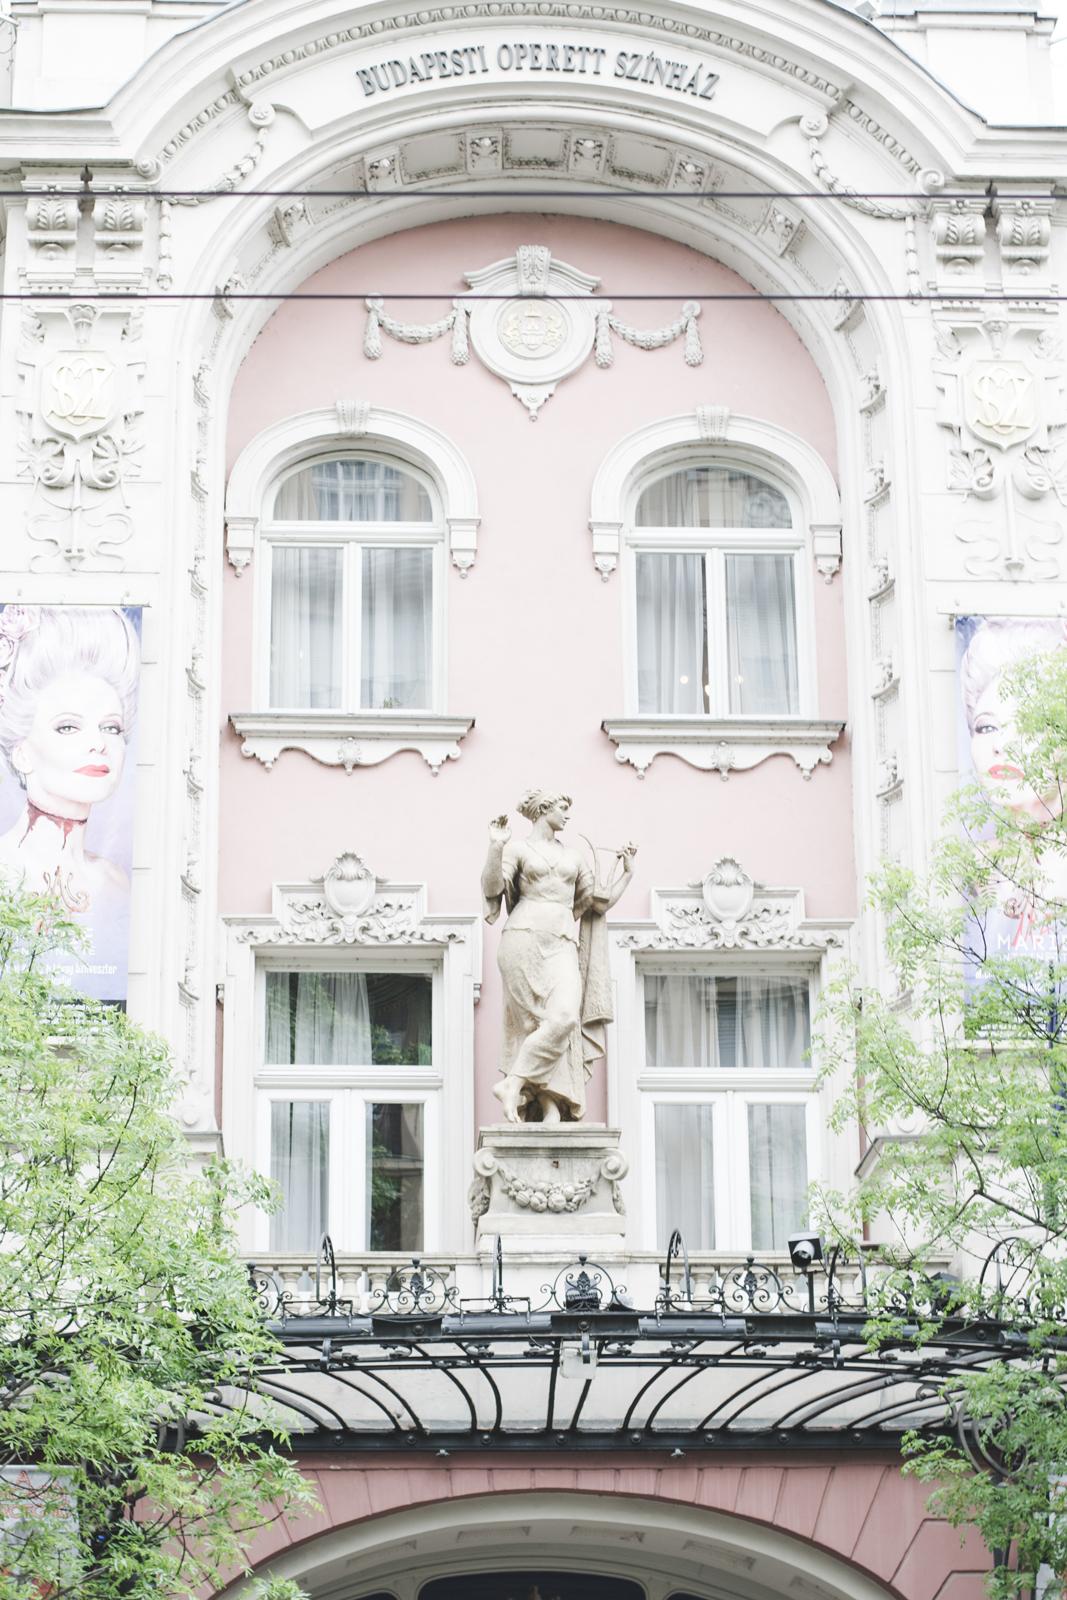 Budapest-Operetta-theater